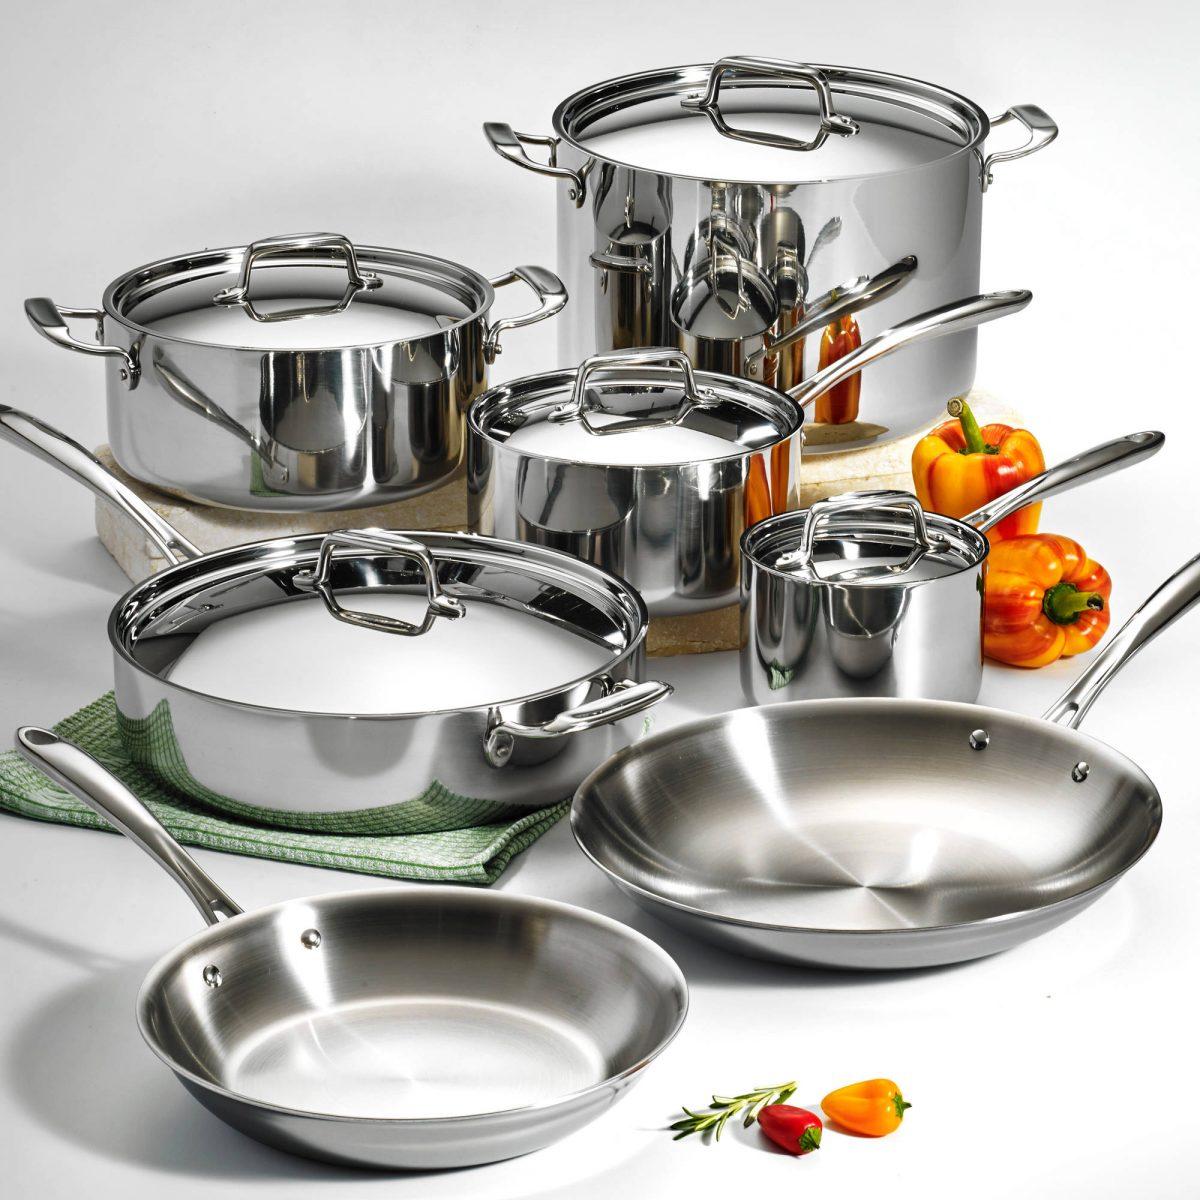 This Tramontina Cookware Set Has